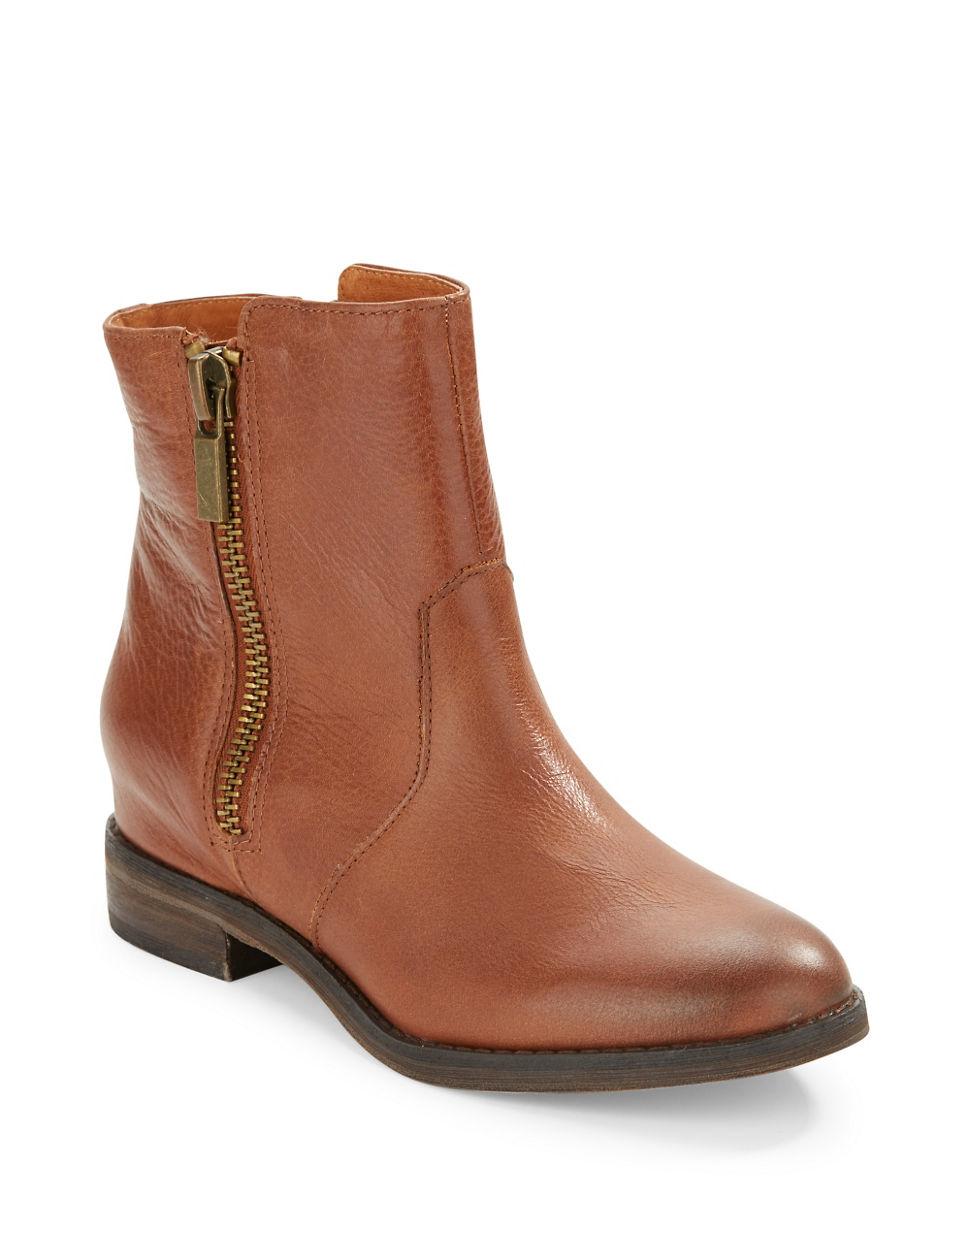 Popular Women39s Shoes Gt Kenneth Cole Reaction Gt 2017 Shoes  Women39s